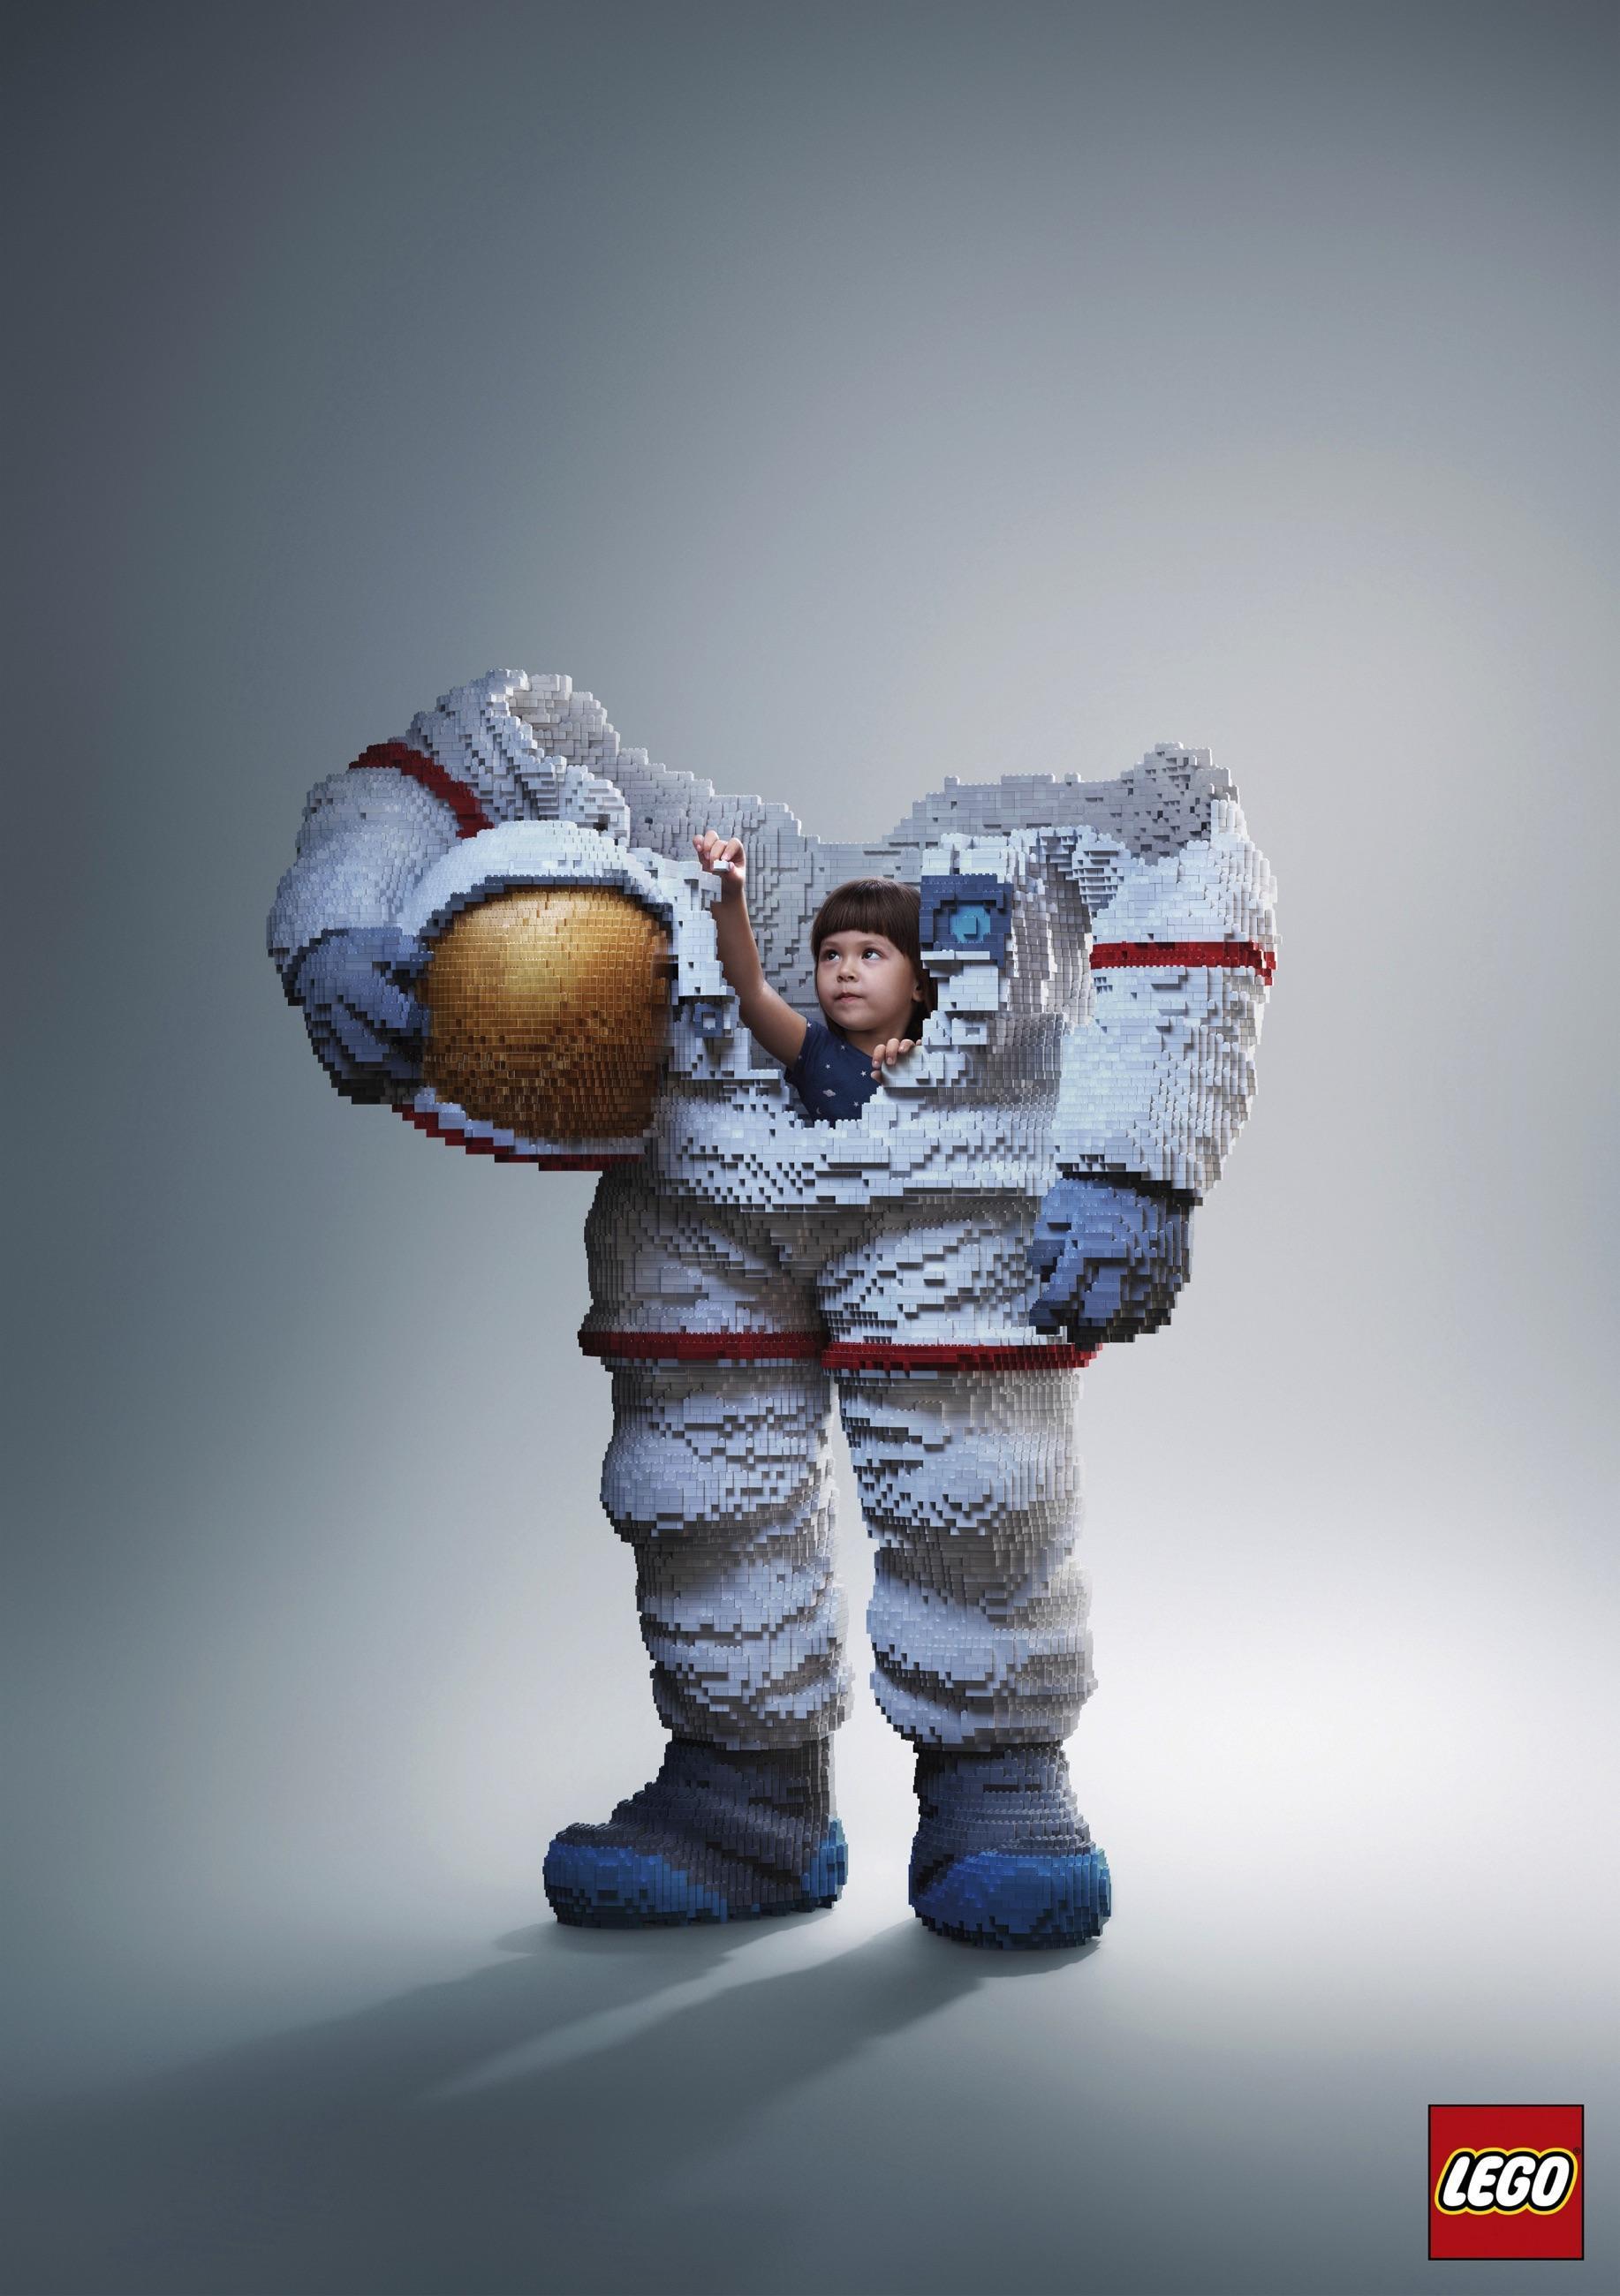 Lego Print Ad - Build the future, Astronaut